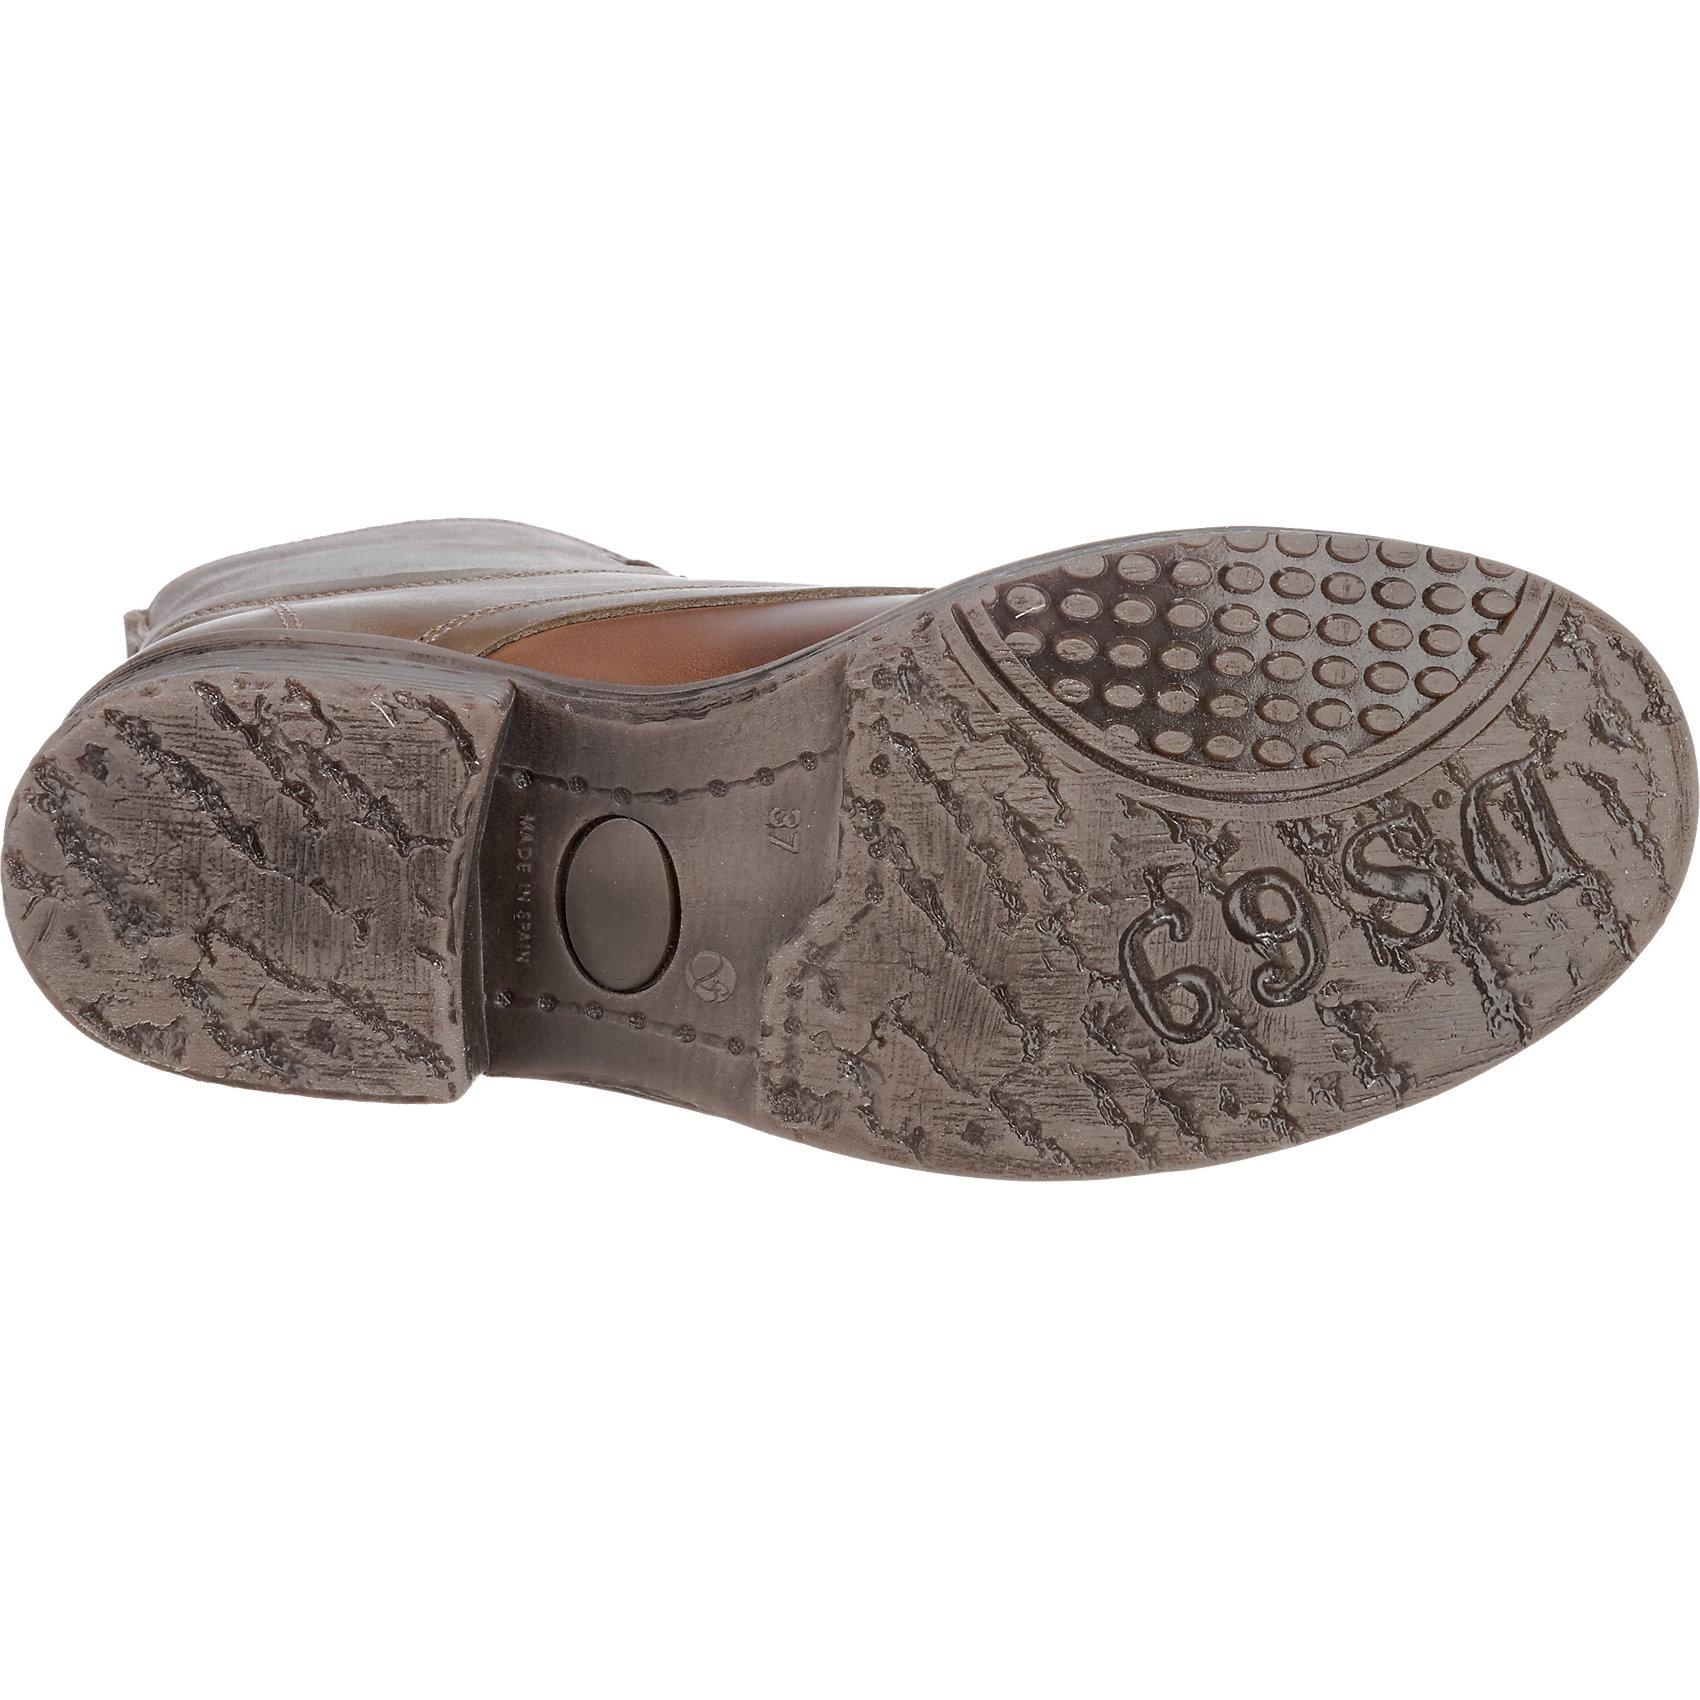 buy popular 814e8 a7d82 ... Nike Men s SF AF1 MID Sz Sz Sz 9.5 Blue Gold 917753 400 71e6bc ...